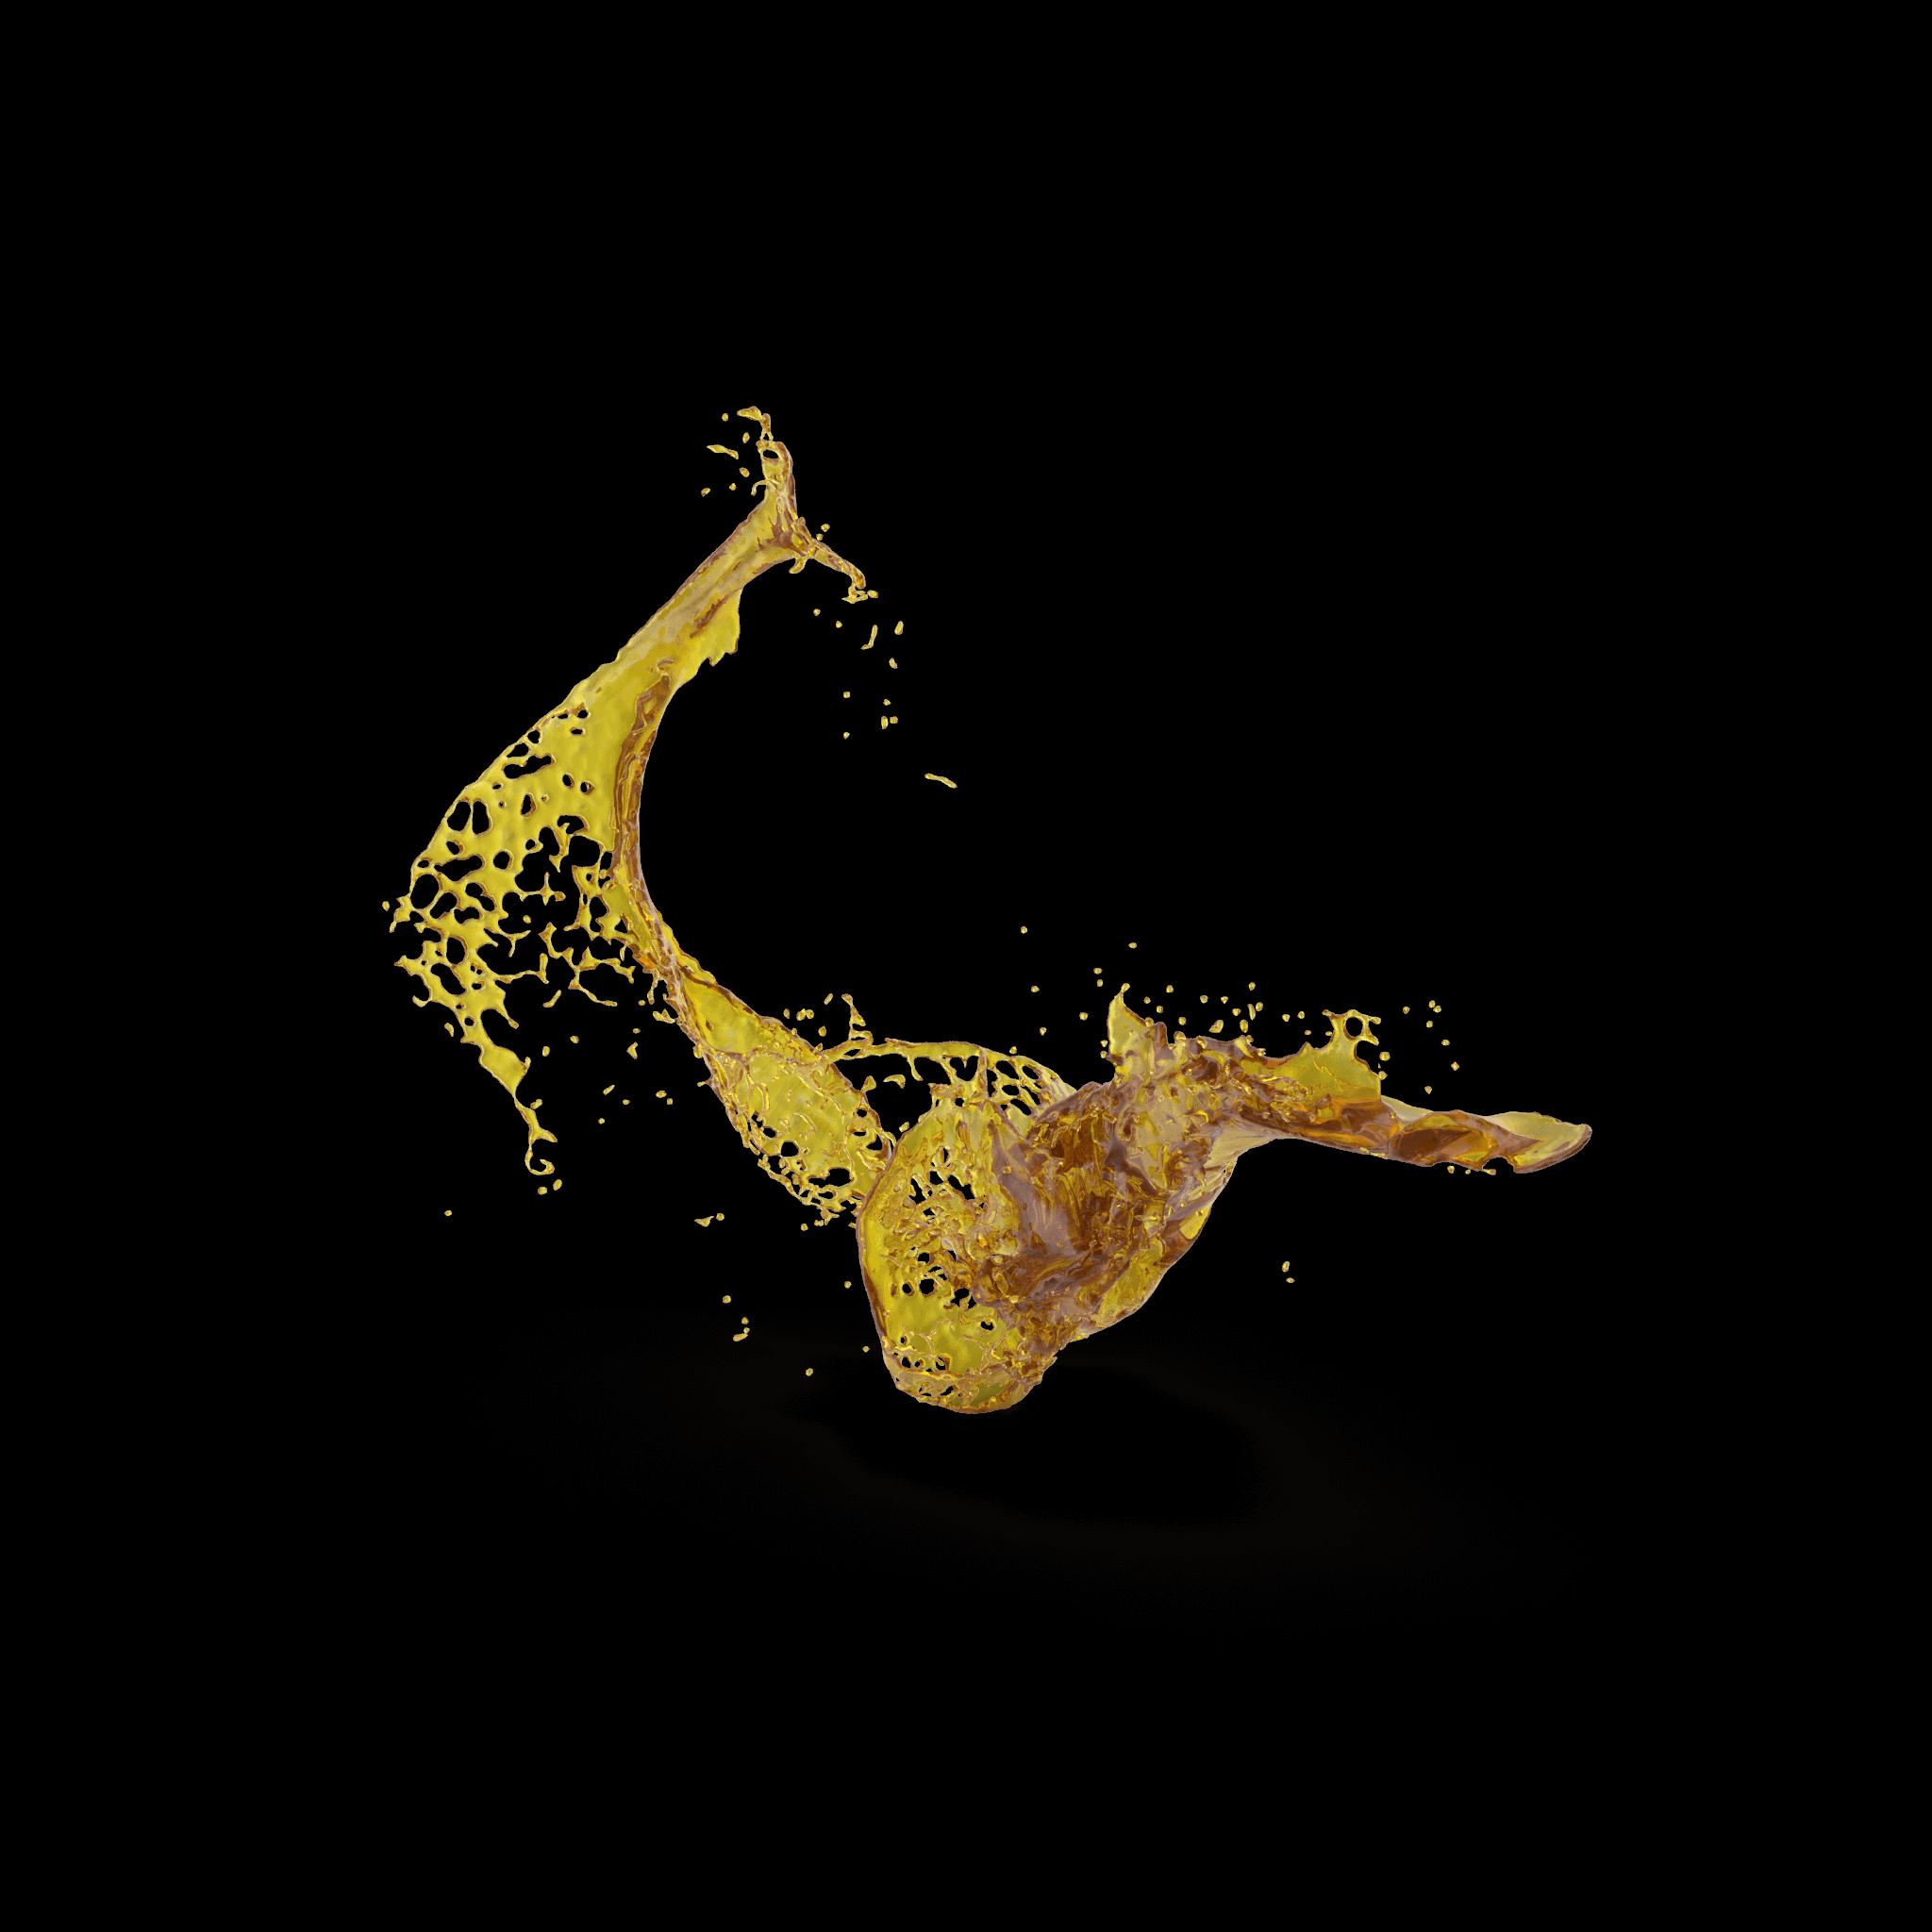 Oil splash